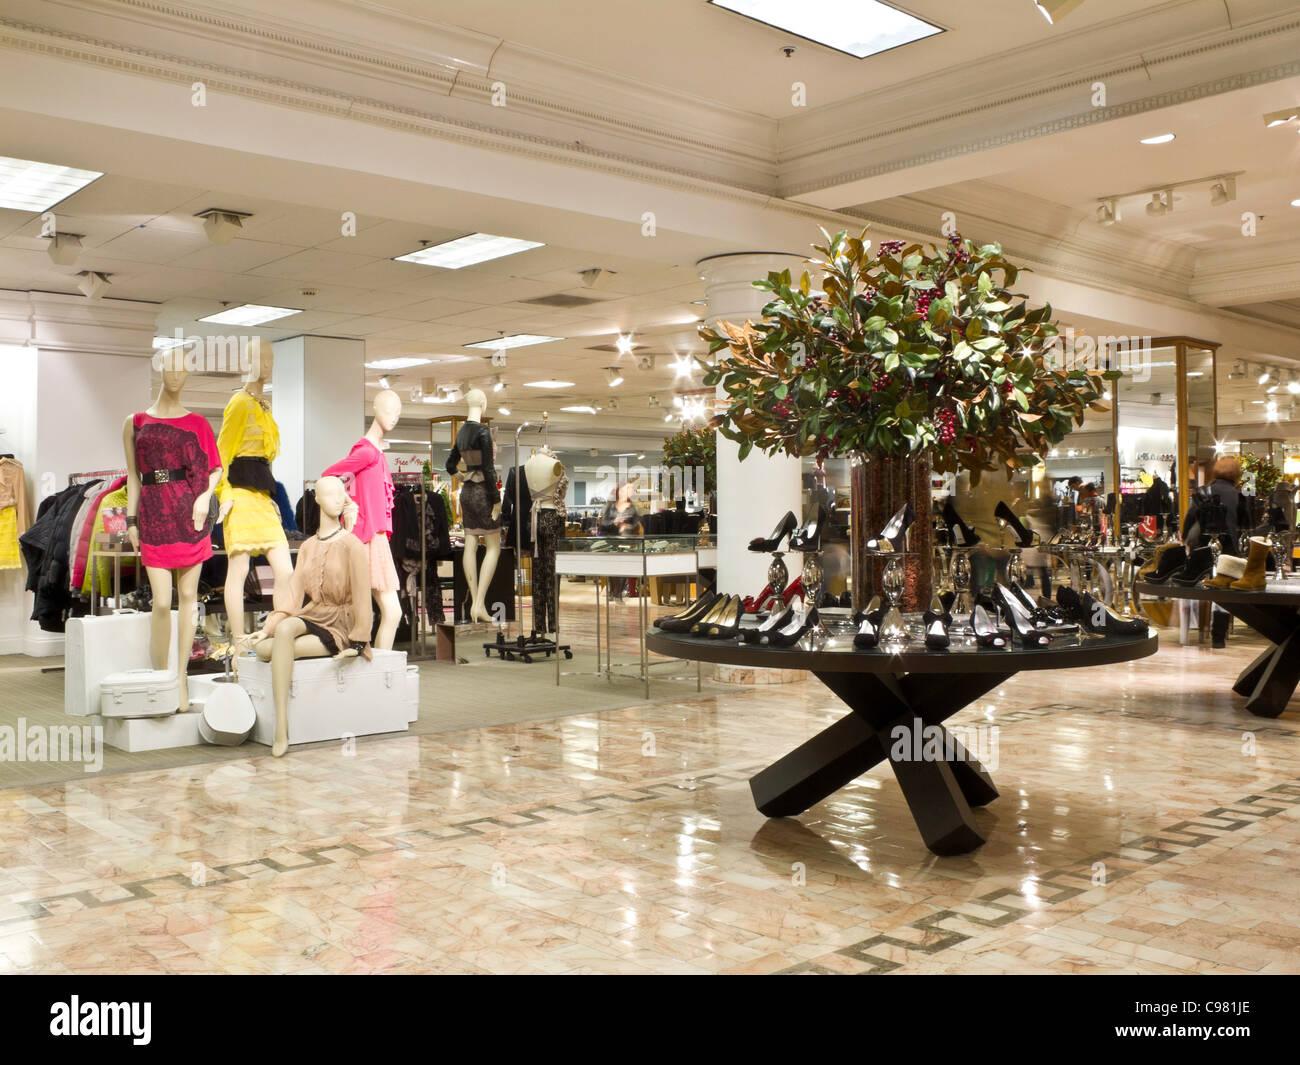 Department Mannequins Clothing Store Interior Stock Photos ...